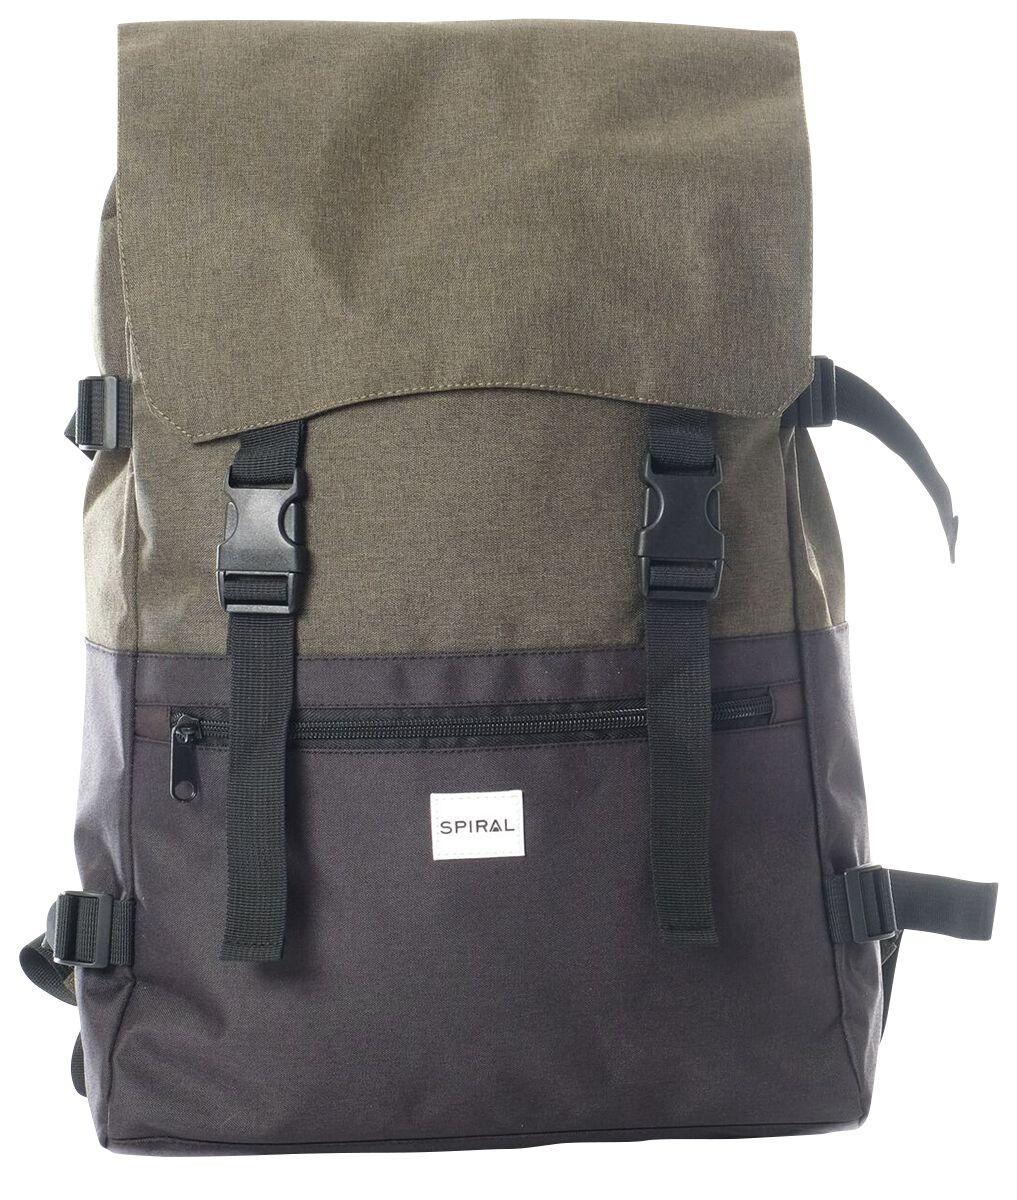 Marki - Torby i Plecaki - Plecak Spiral UK Olive-Black Plecak oliwkowy/czarny - 370957